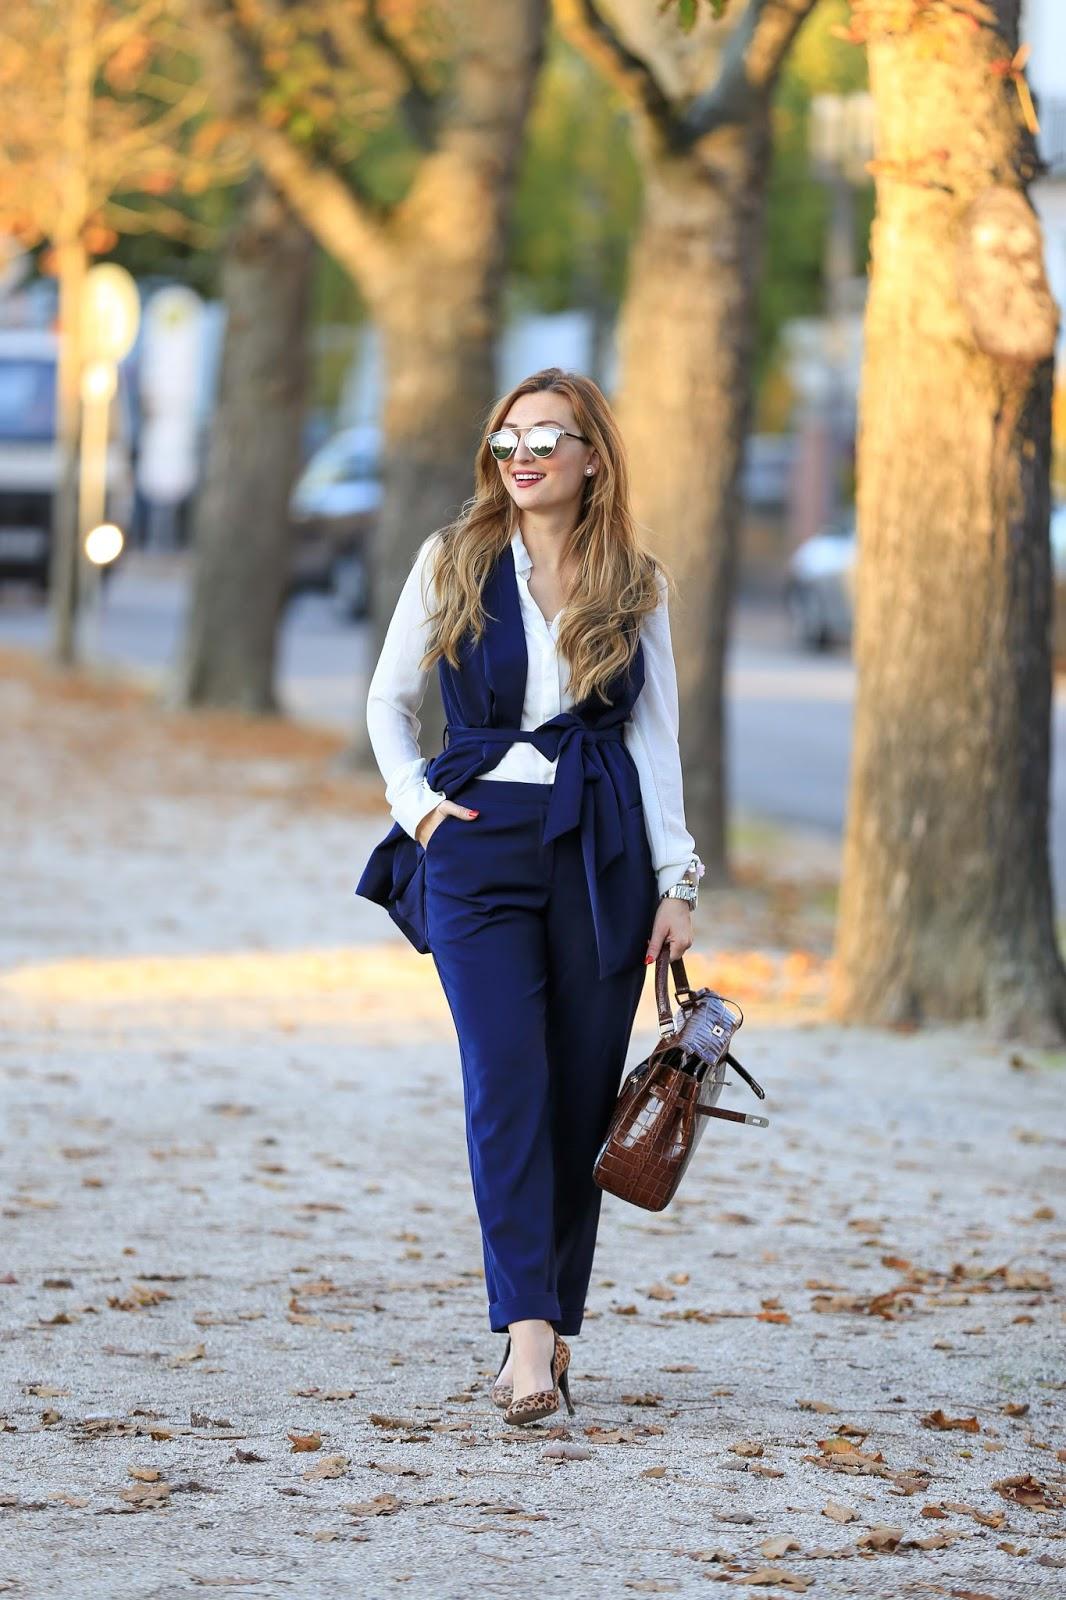 Blogger-Fashionblogger-Streetsylelook-Streetstyleblogger-Fashionstylebyjohanna-Olivia Palermo Style -Business look- Casual Look- Chic Look -Picard Tasche -Tasche Kroko-Kroko Tasche